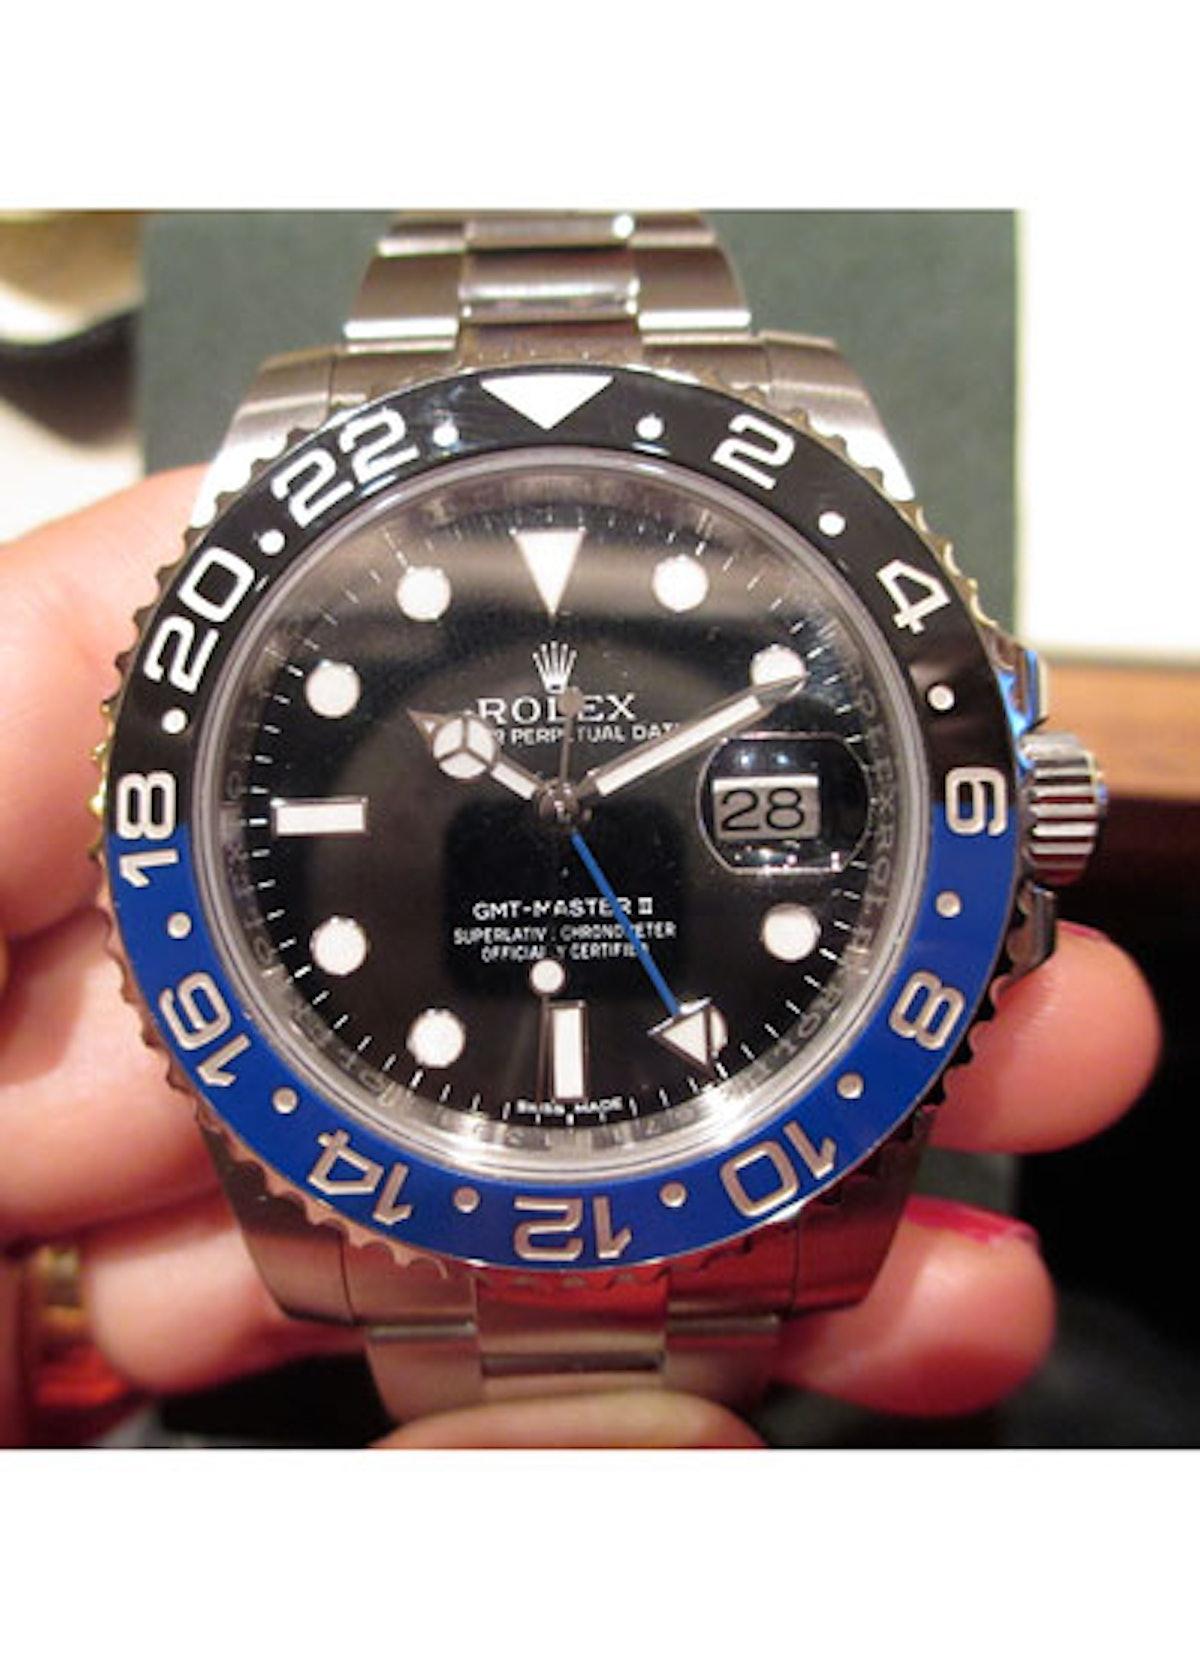 acss-claudia-mata-blue-watches-06-v.jpg